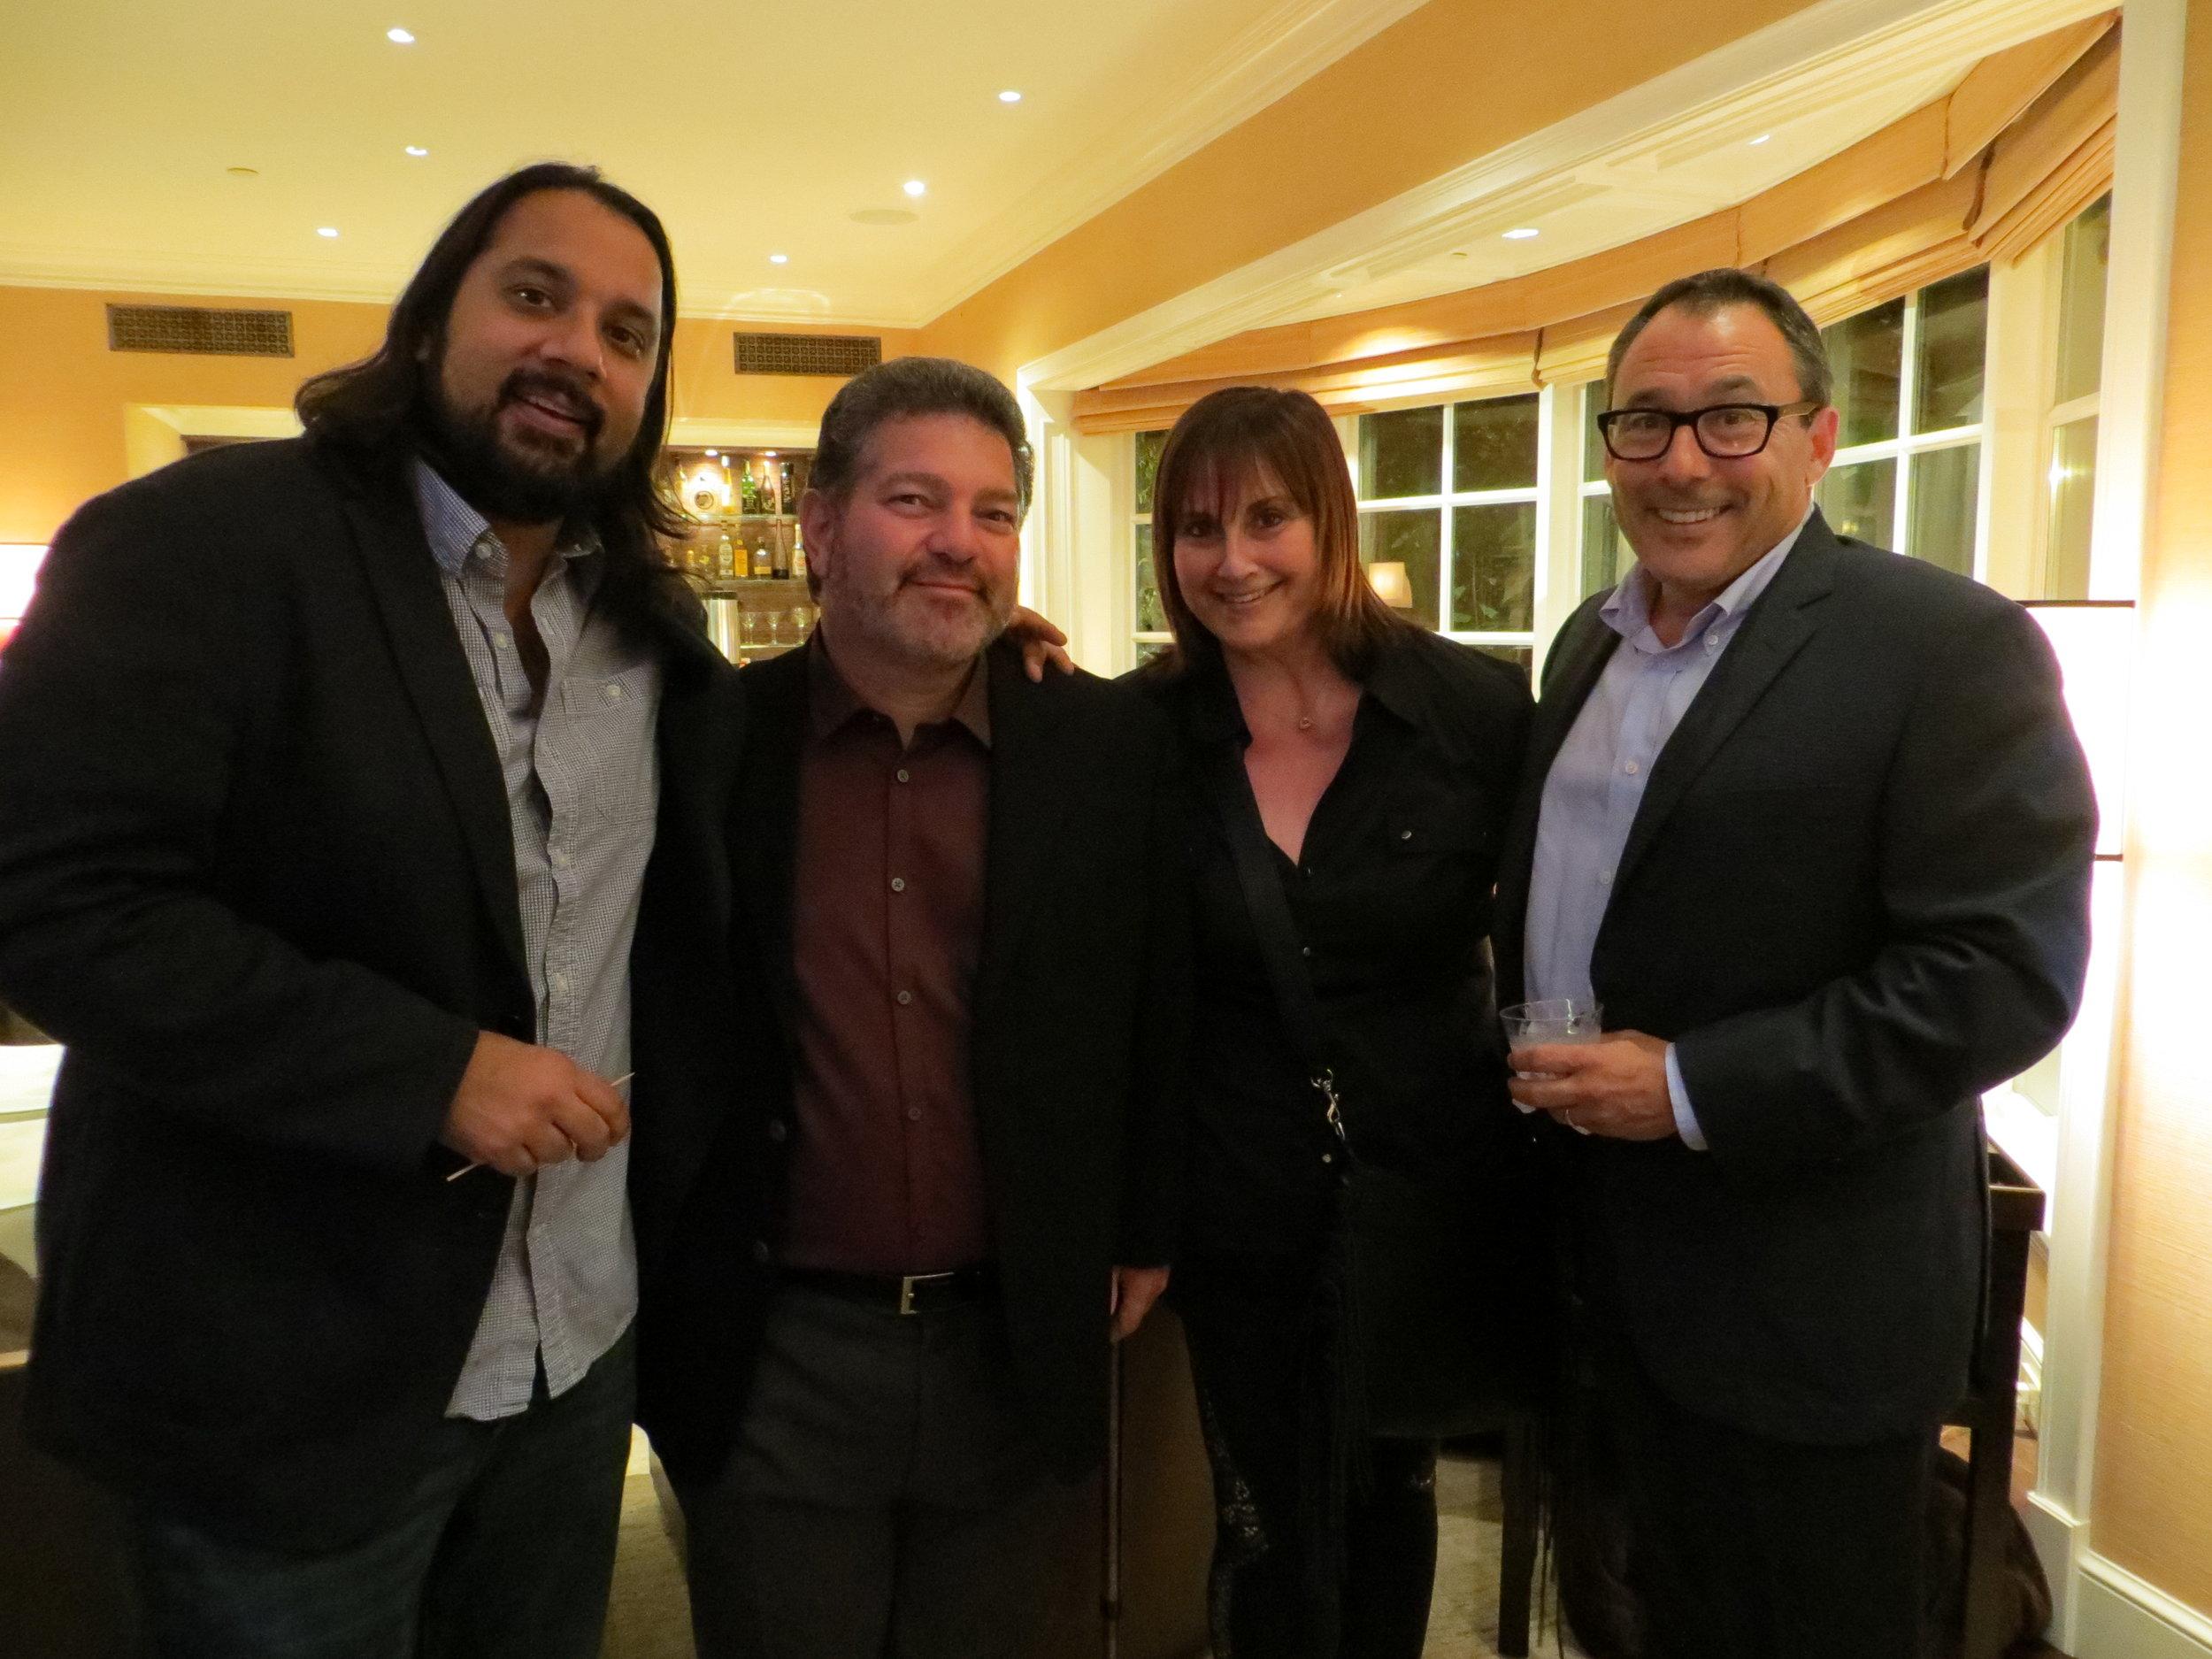 Vijal Patel, Allen Zipper, Barbara Bemel & Jeff Levy